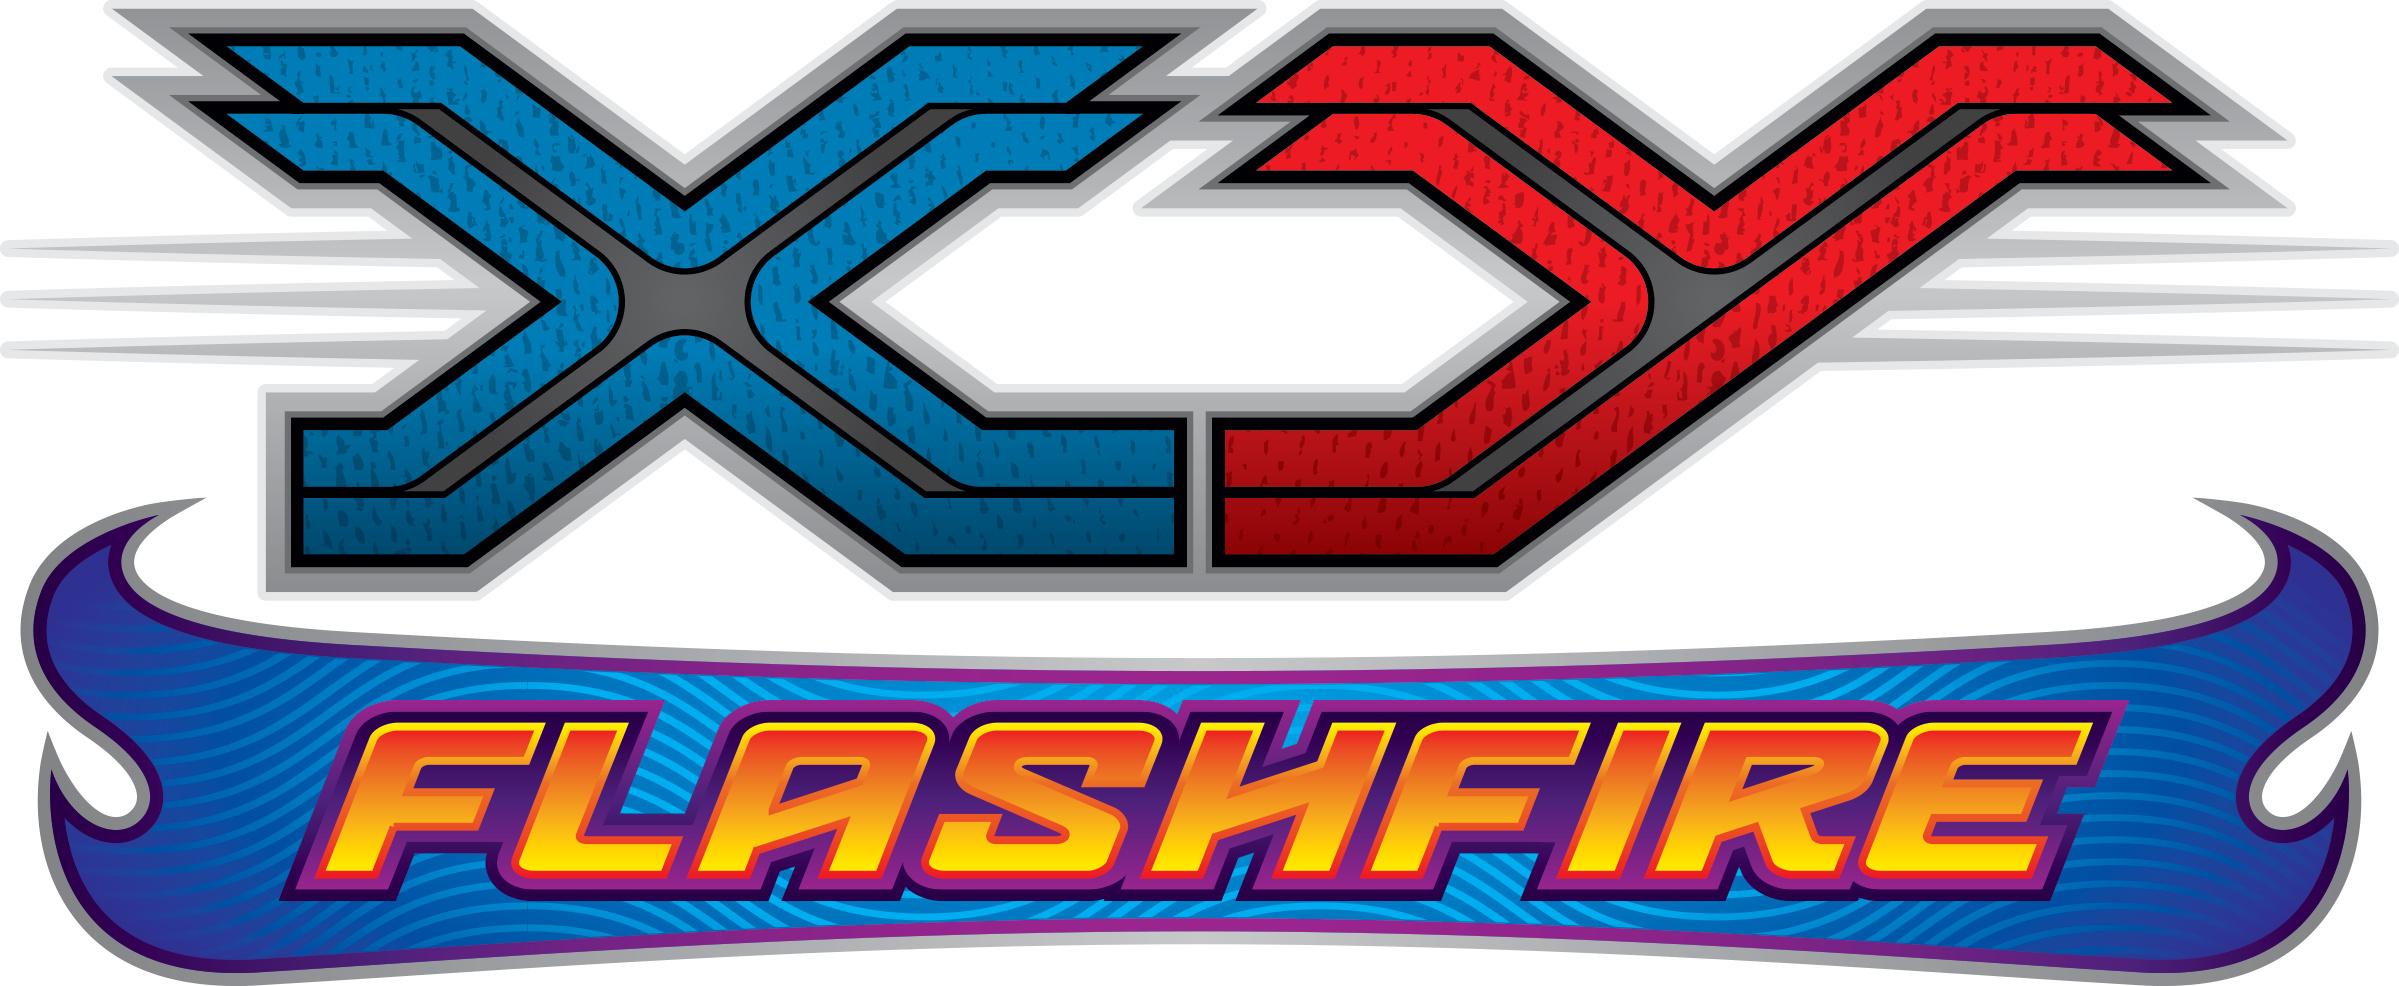 Flash Fire Decks Original